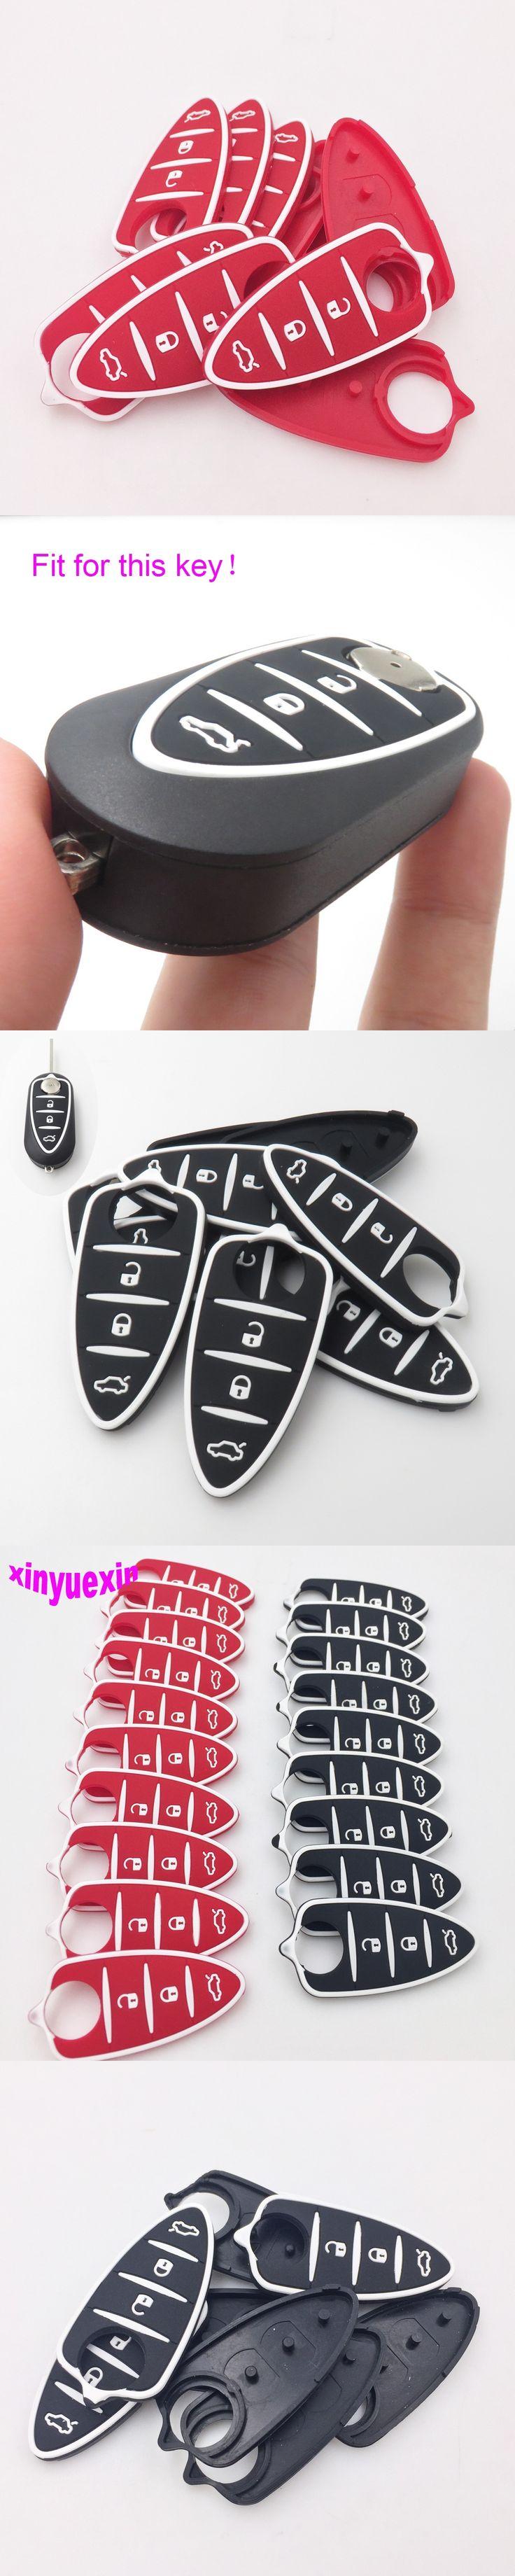 Xinyuexin Silicone Car Key Pad For Alfa Romeo 4C Mito Giulietta Myth 159 GTO GTA Flip Remote Car Key